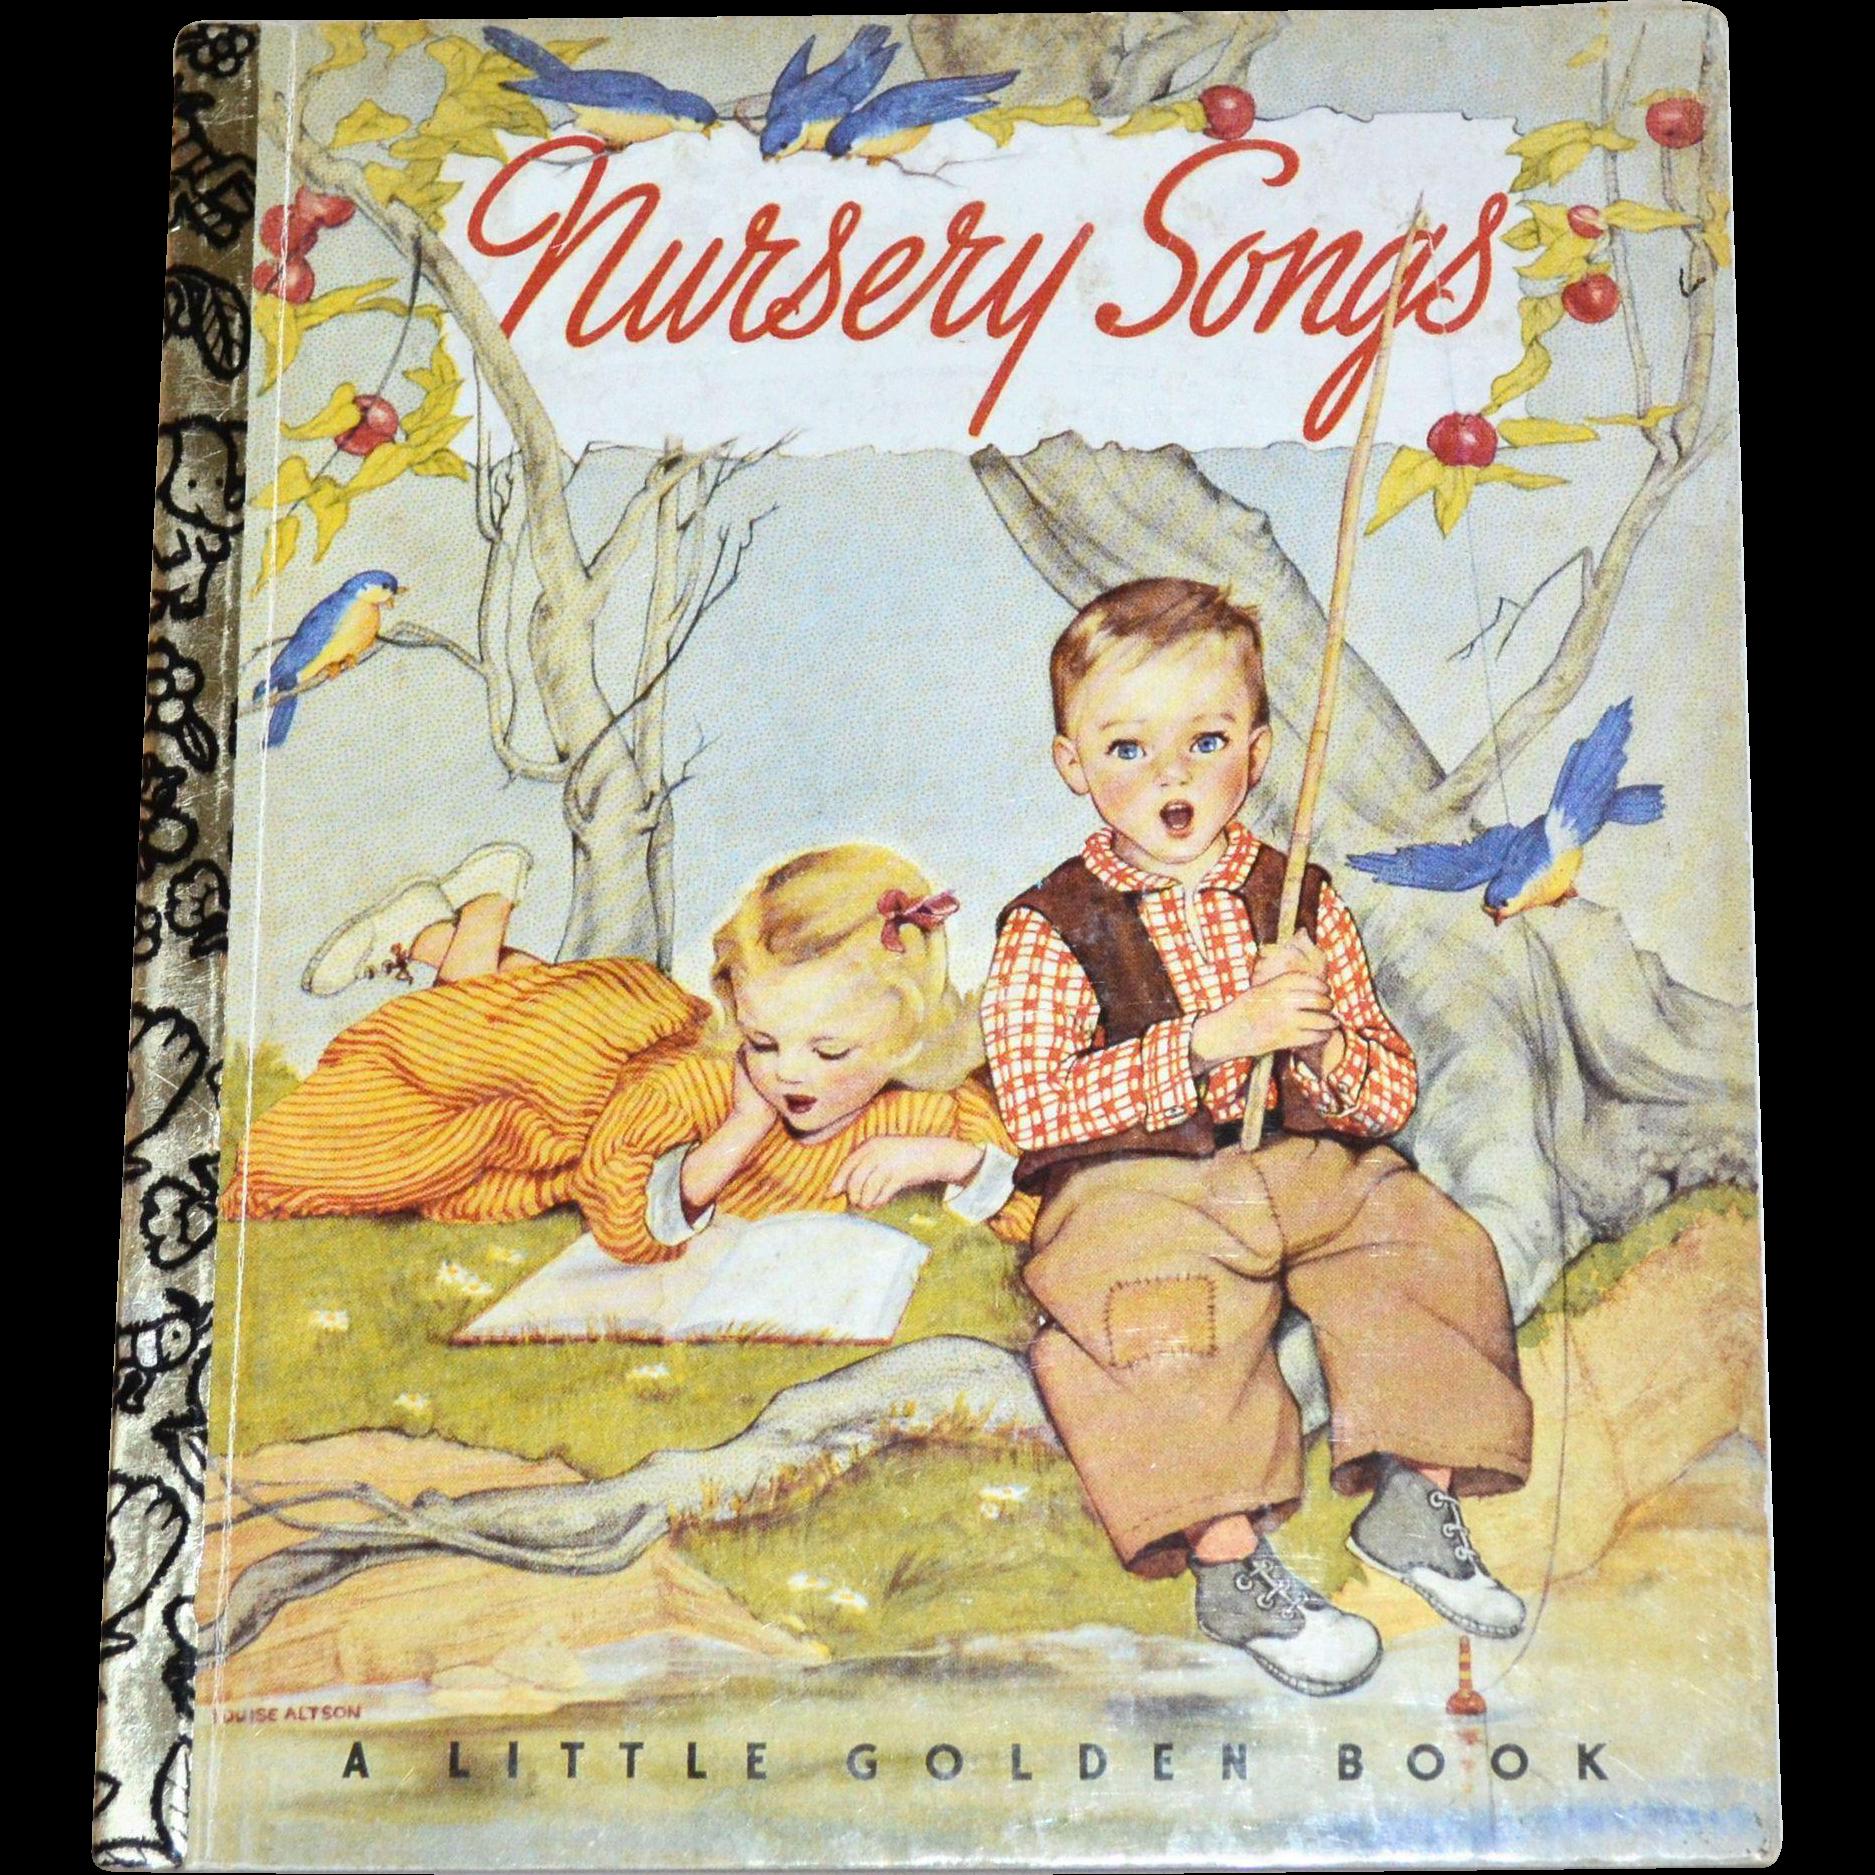 1992 Nursery Songs 50th Anniversary Little Golden Book